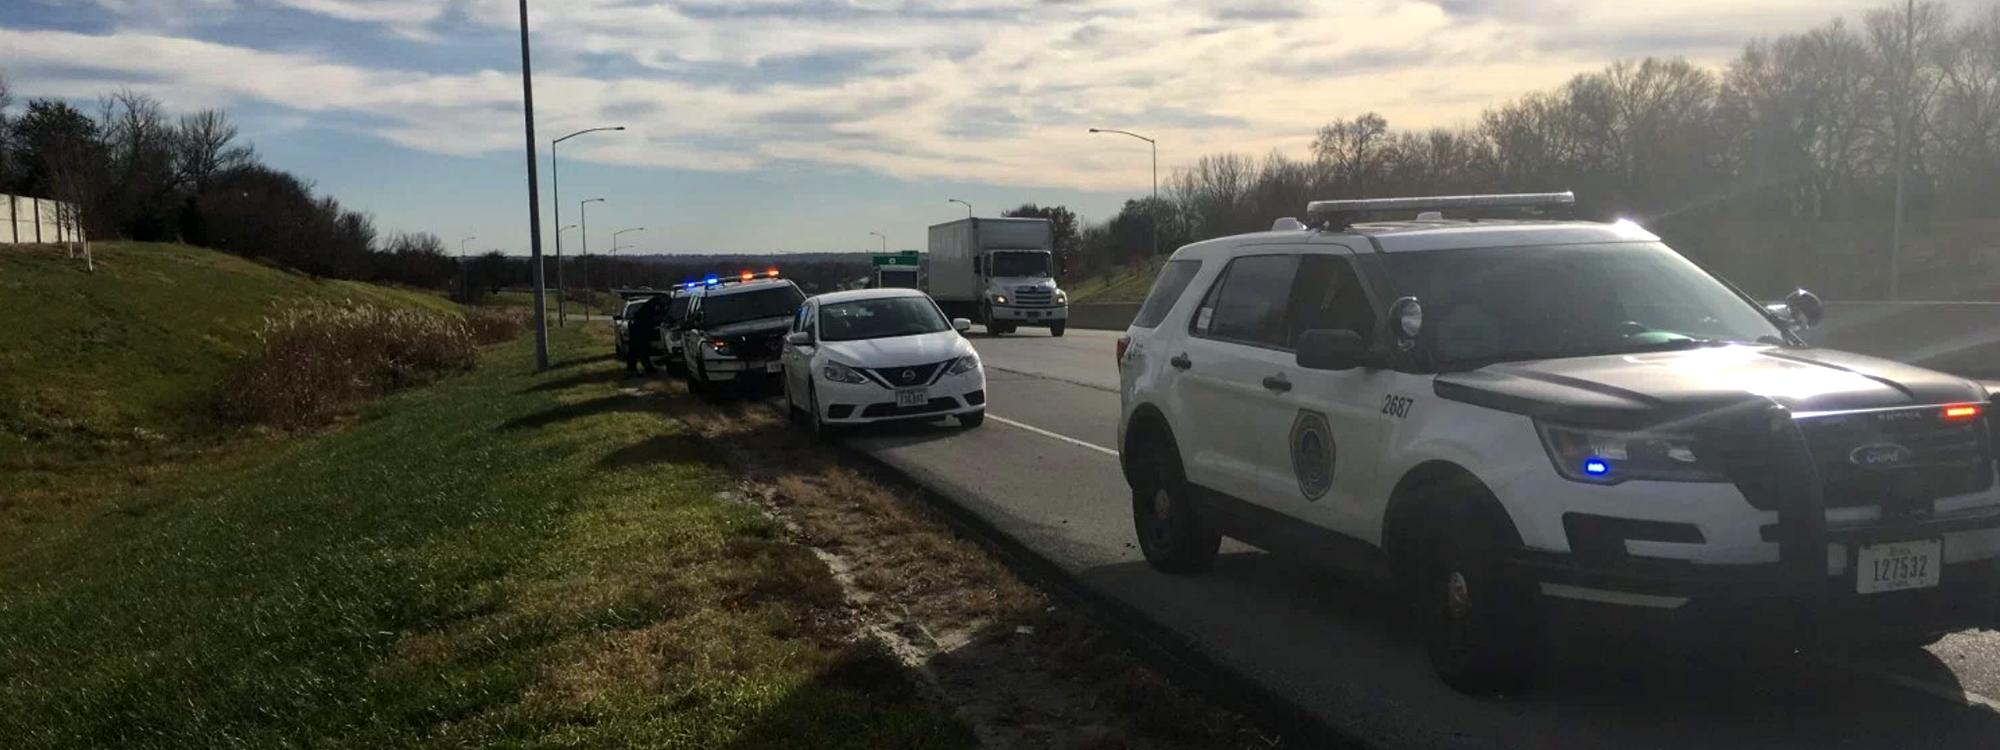 Iowa AMBER Alert Traffic stop